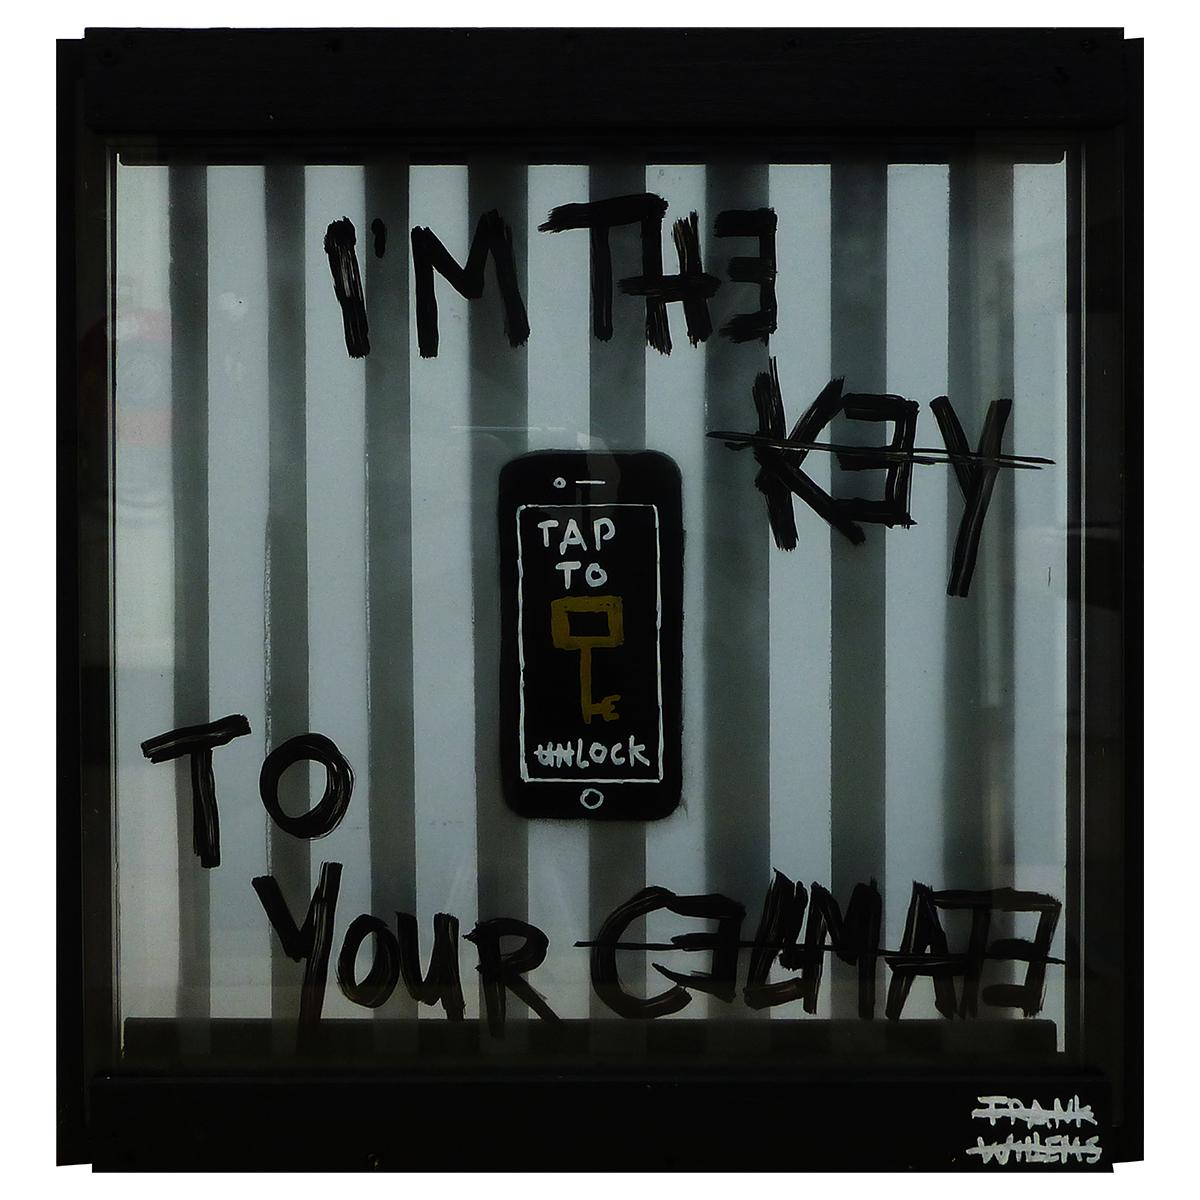 TAP TO (UN)LOCK - Frank Willems